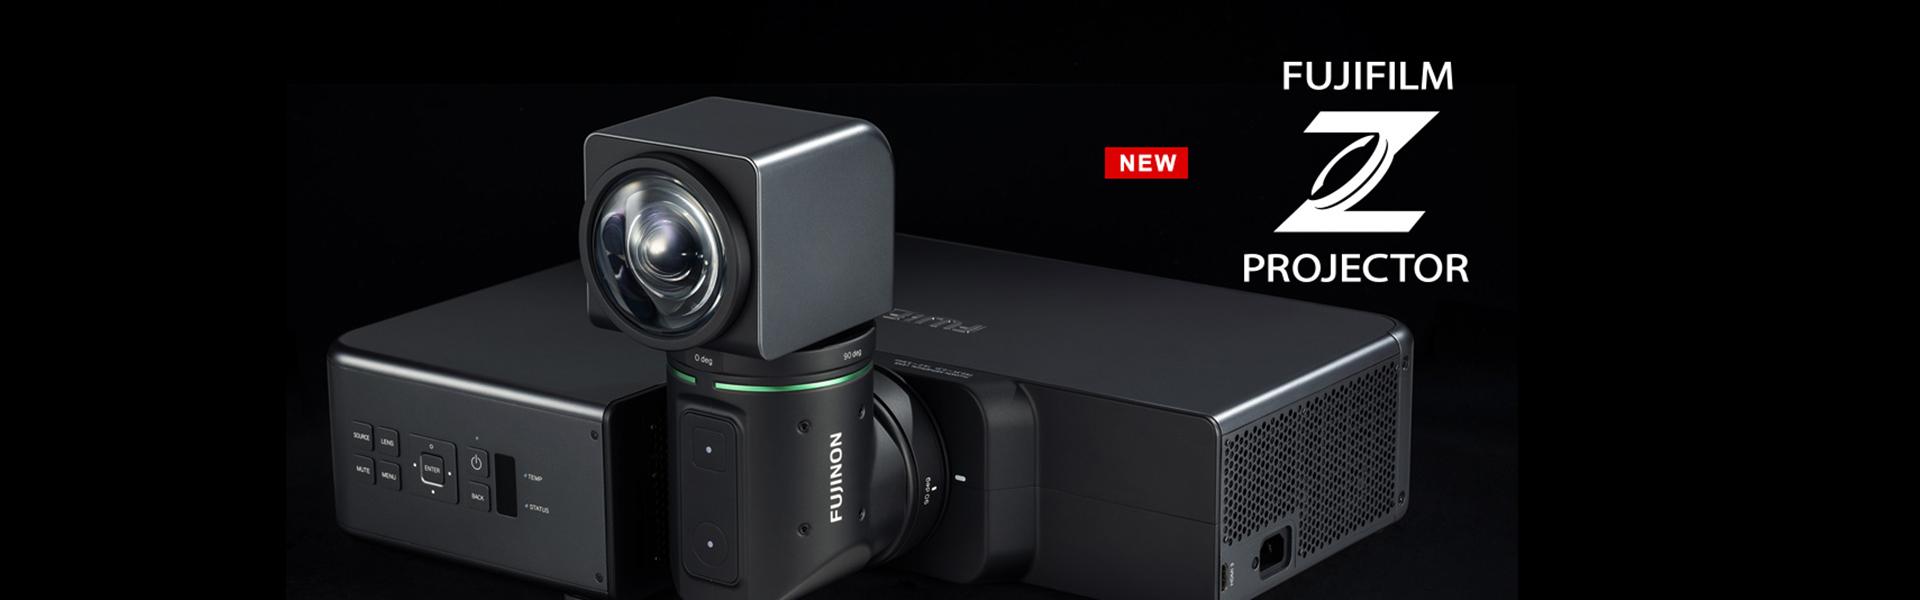 [photo] Fujifilm Z Projector FP-Z5000 in front of black background